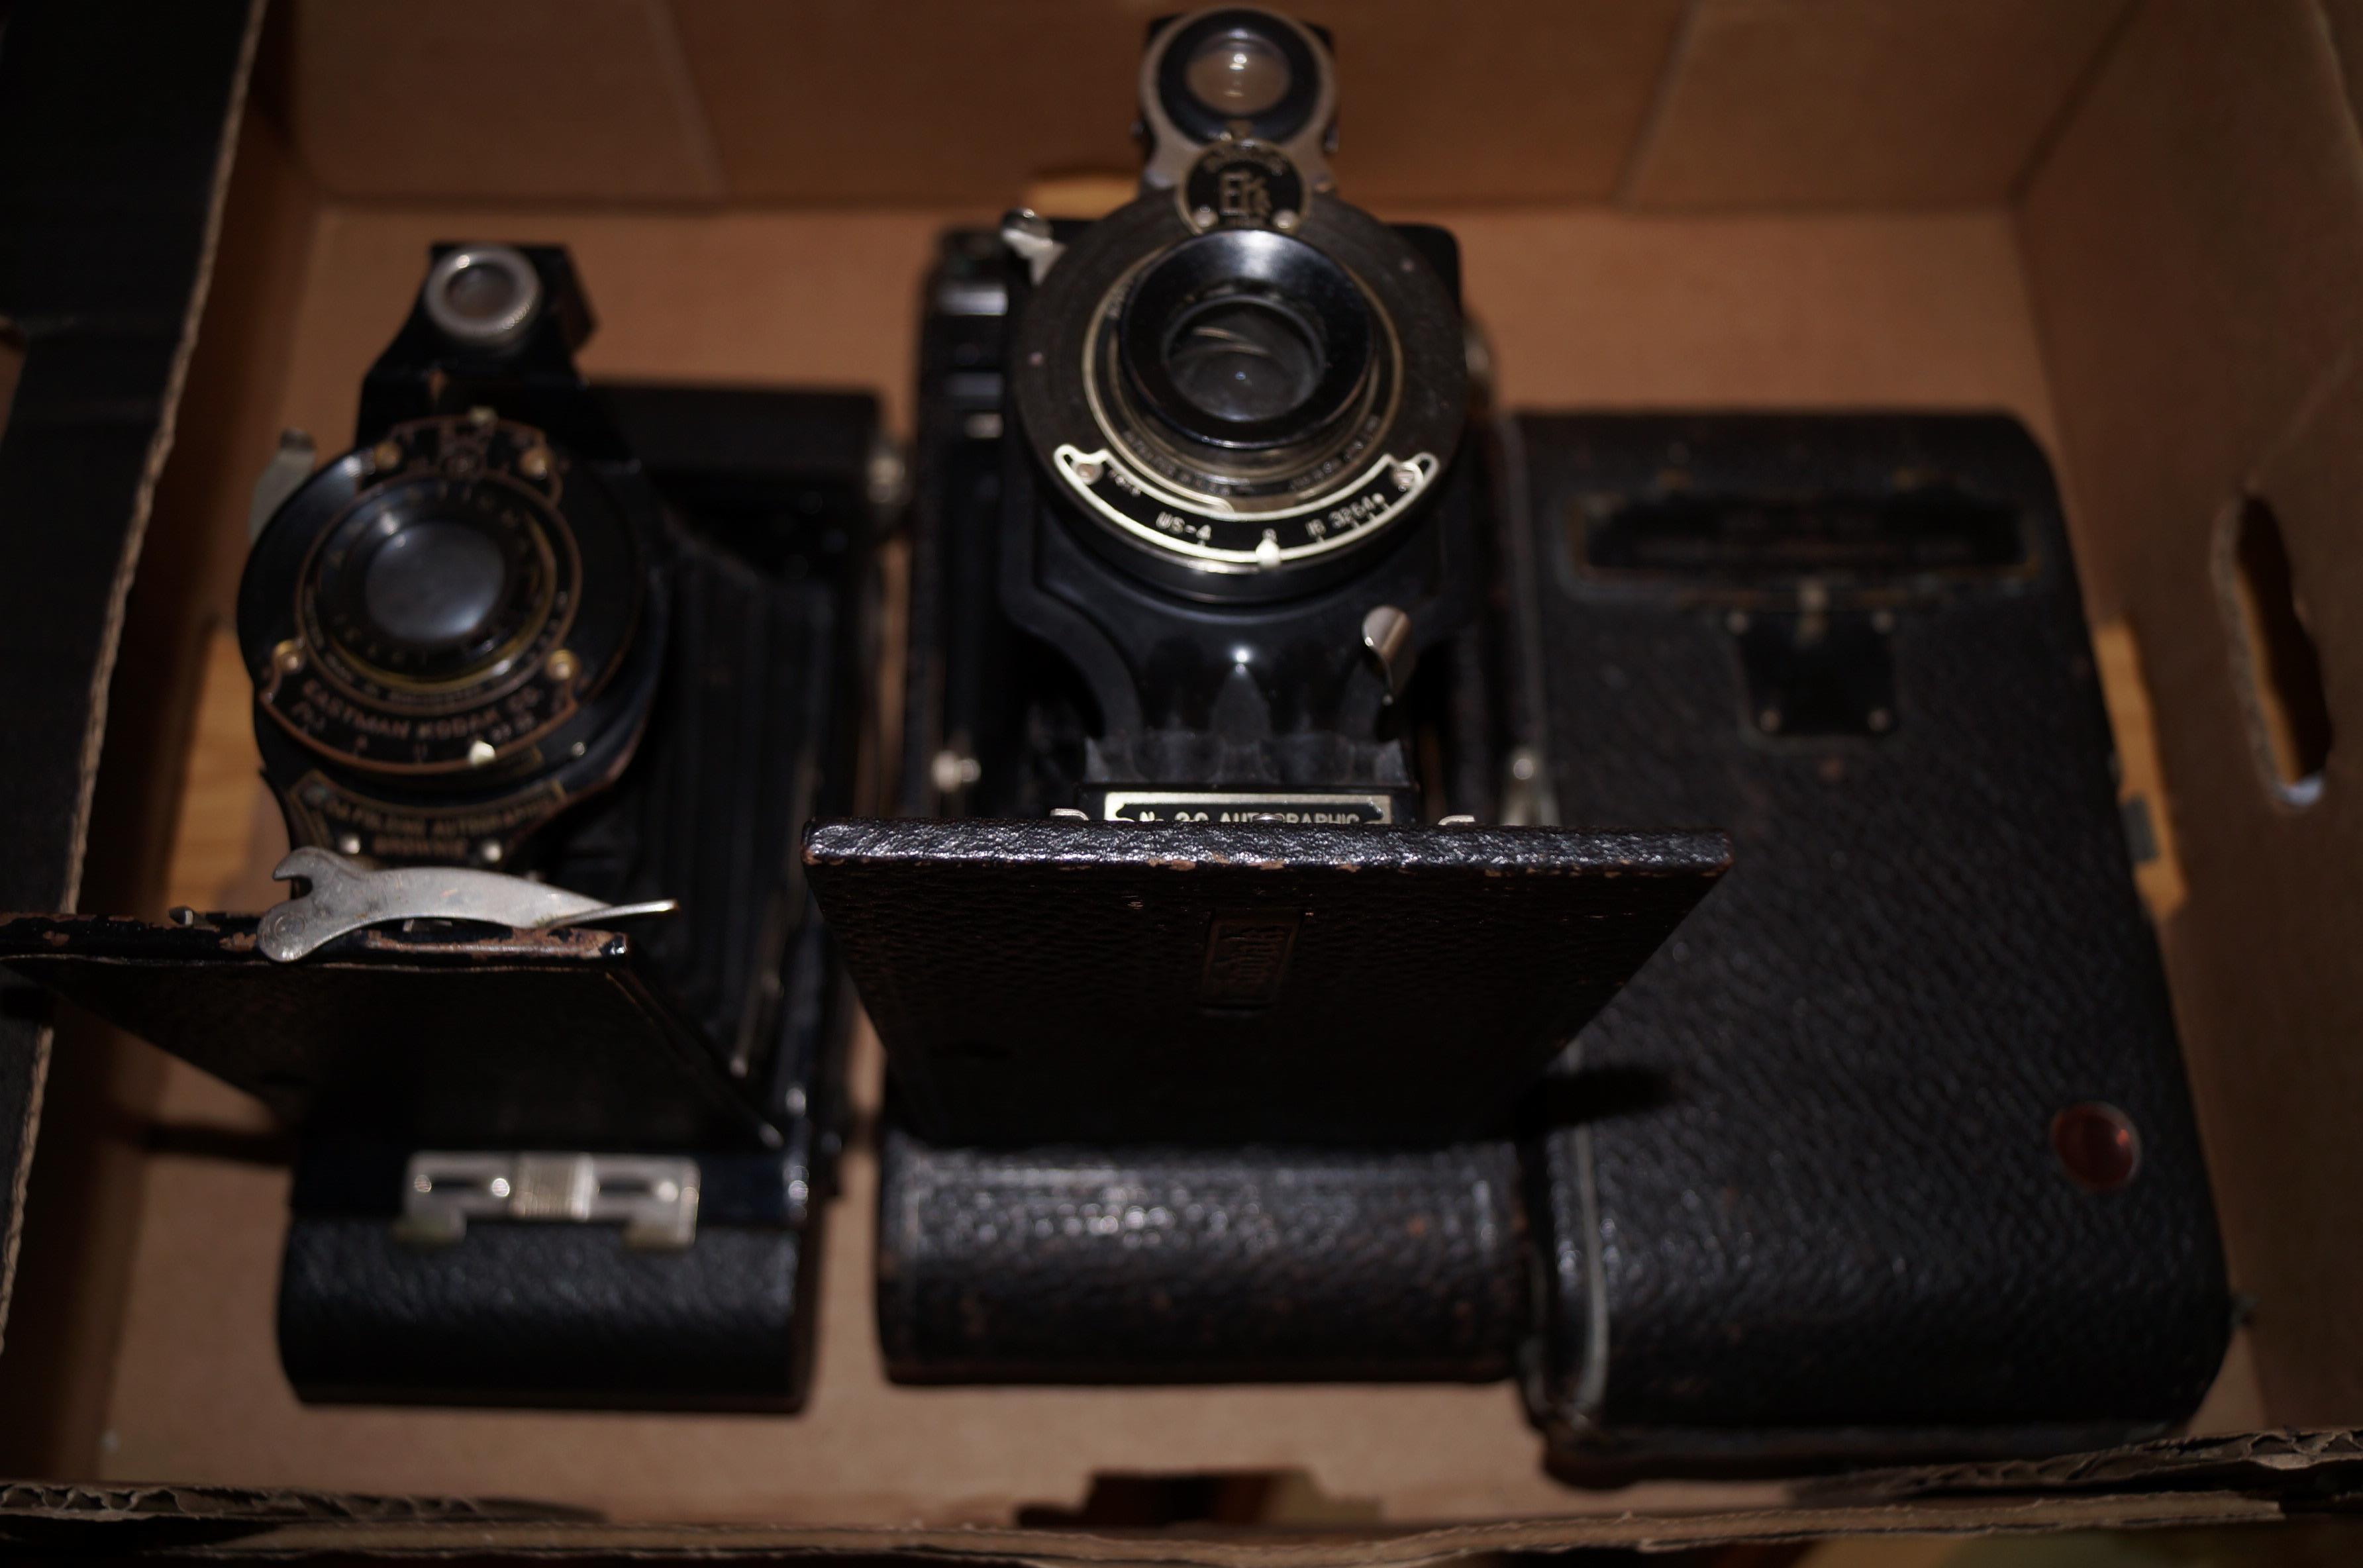 Lot 10 - 3 Vintage cameras